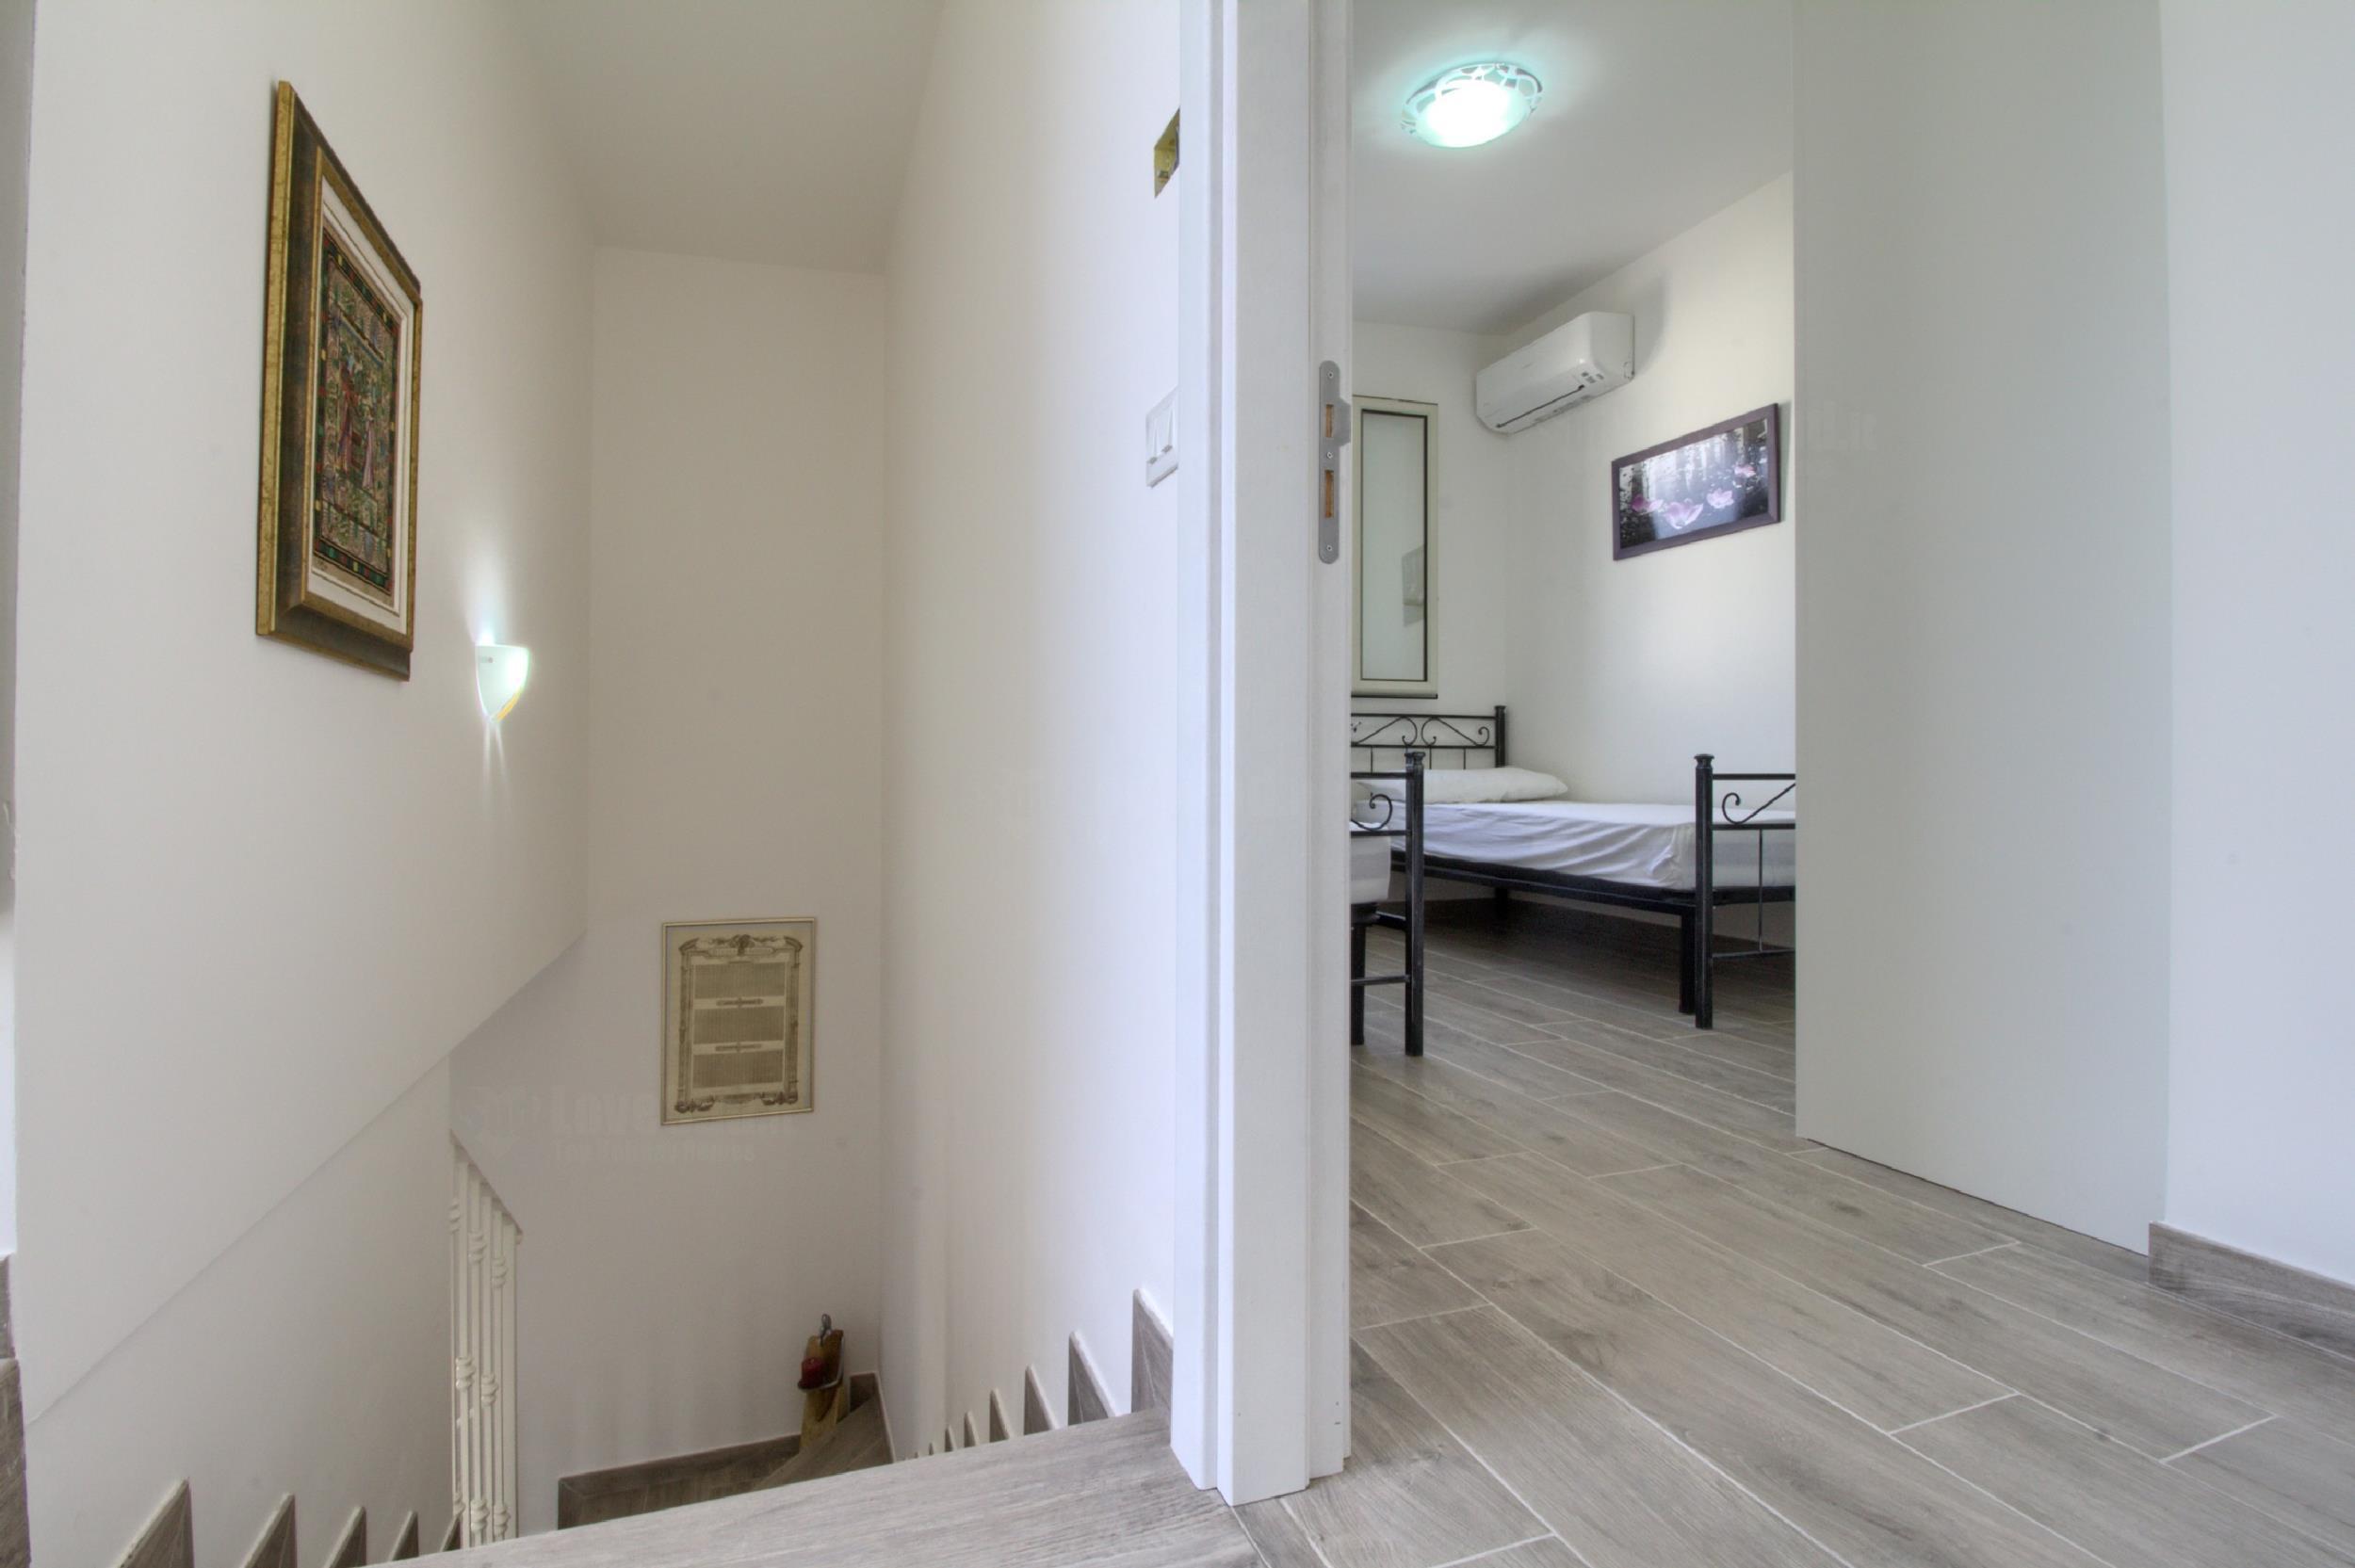 Apartment Blanca deluxe house photo 25761904